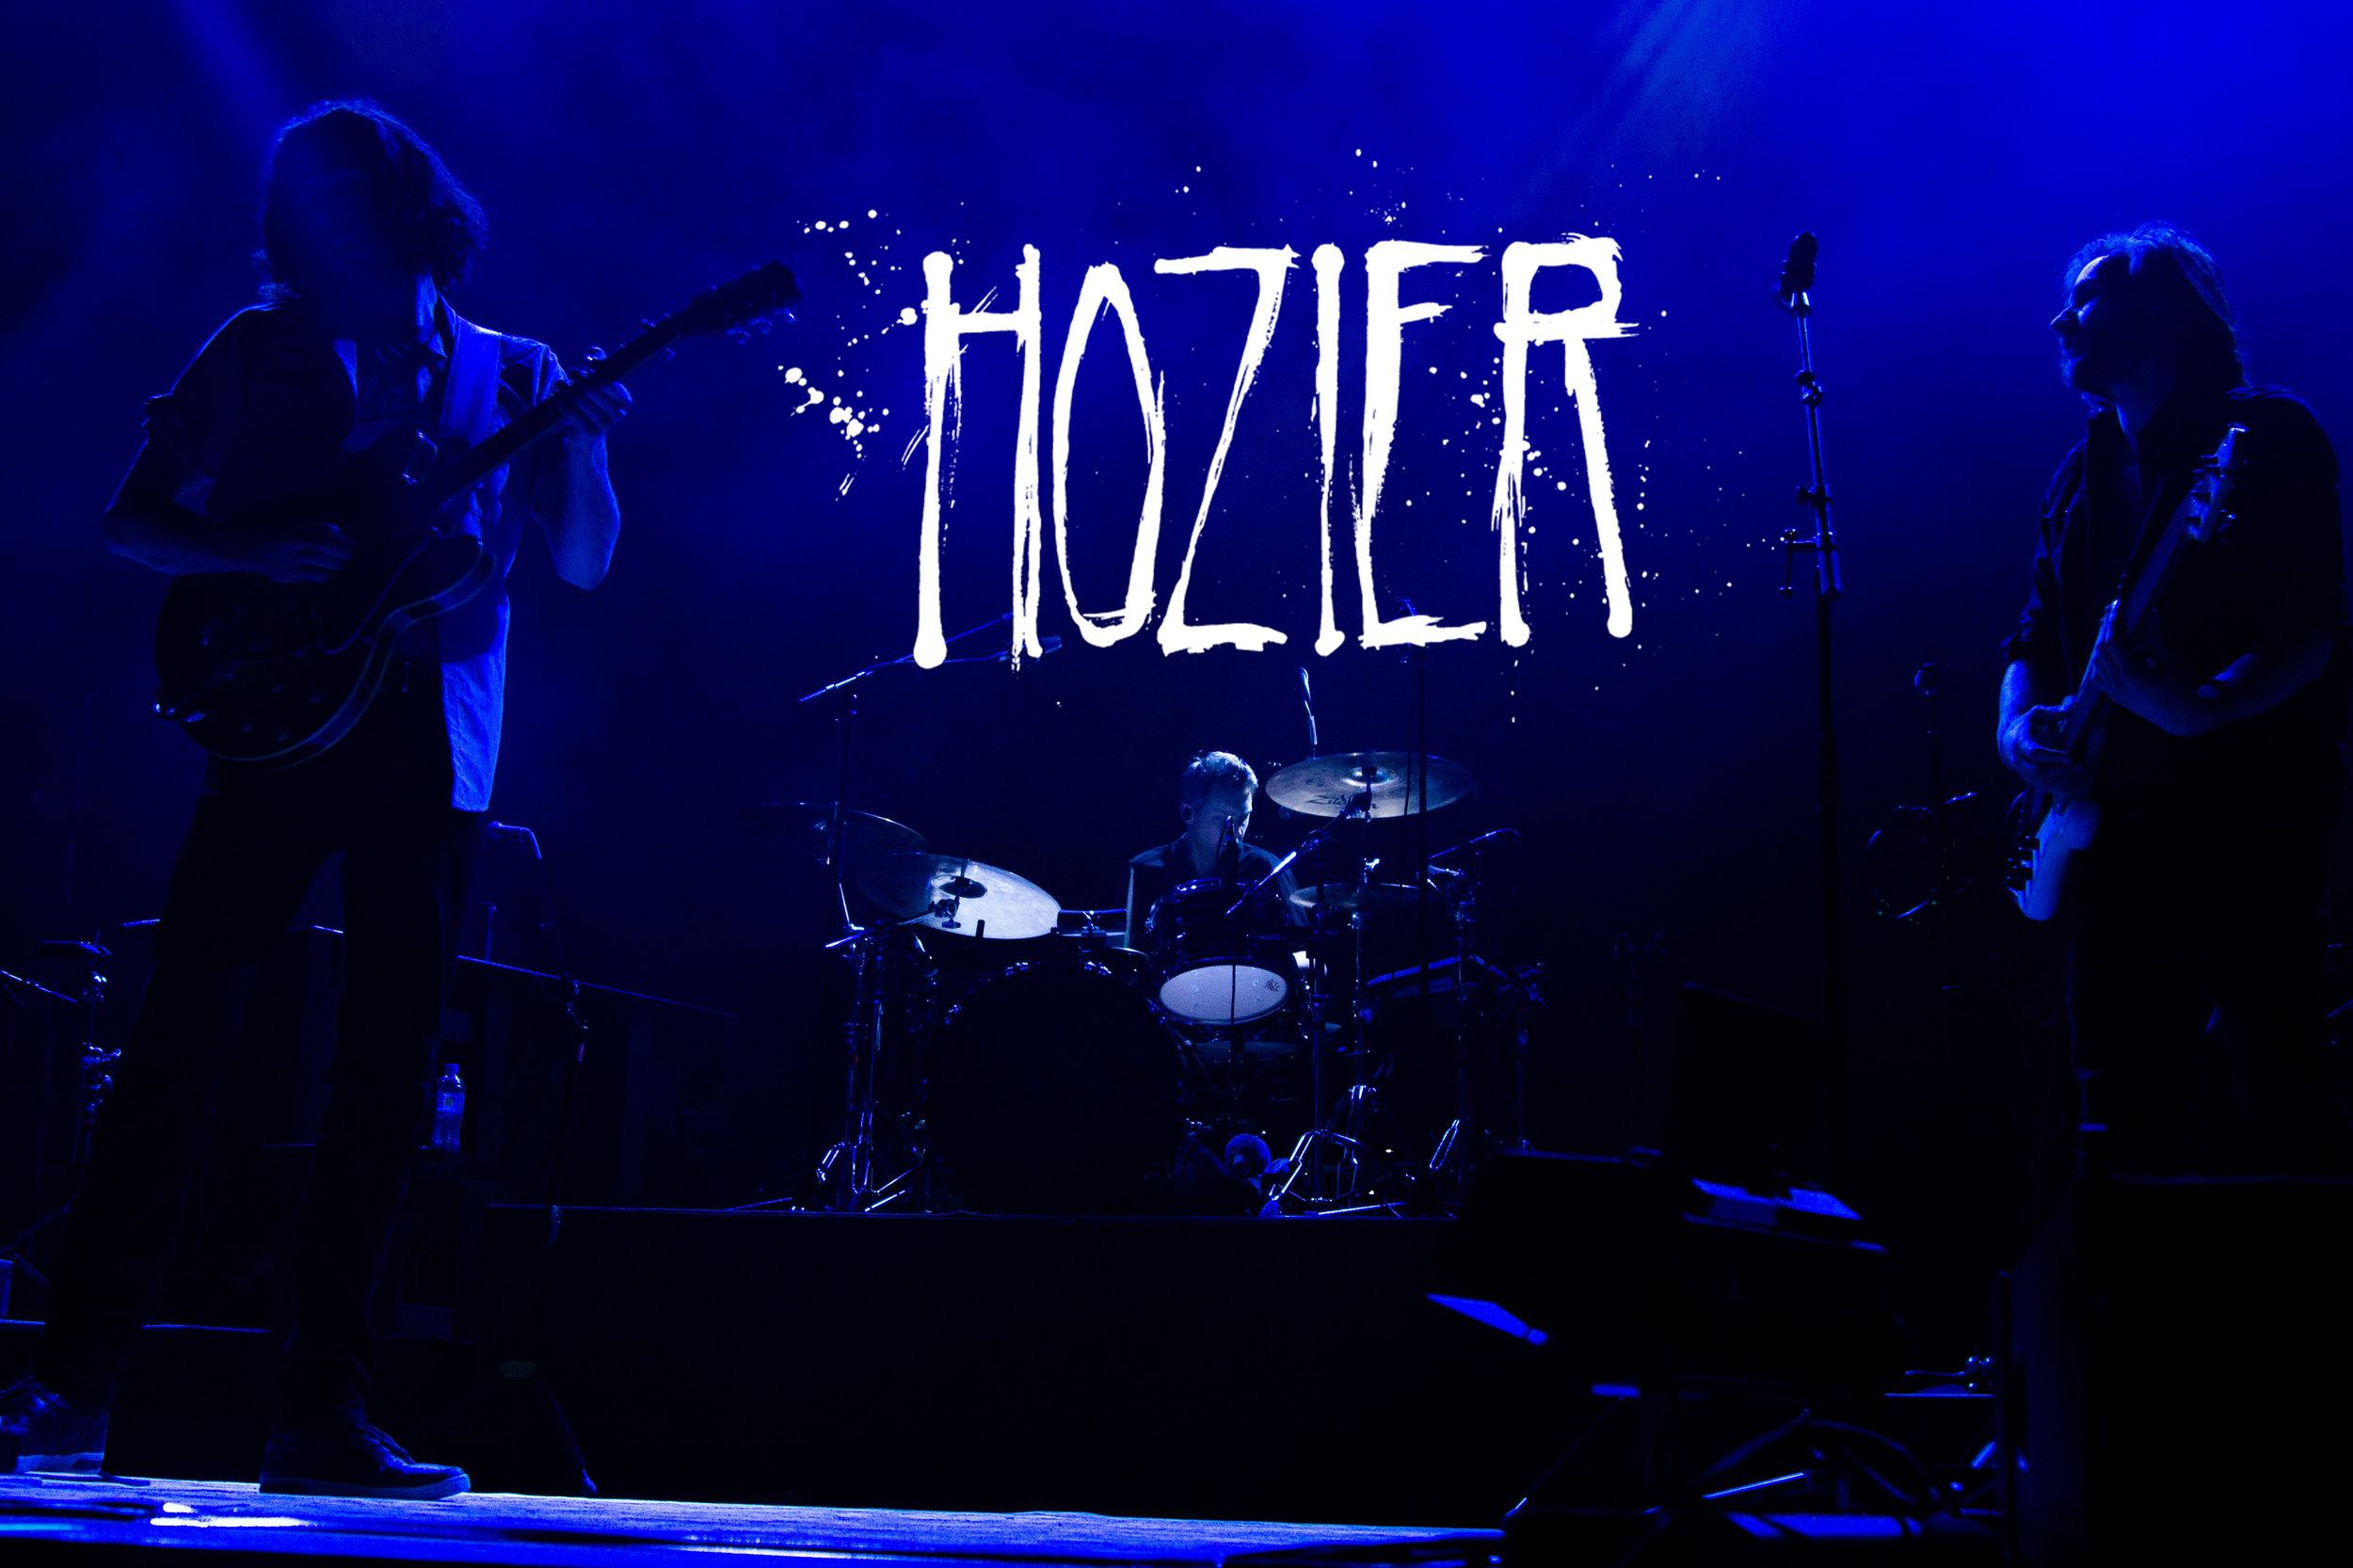 HOZIER-title-1.jpg